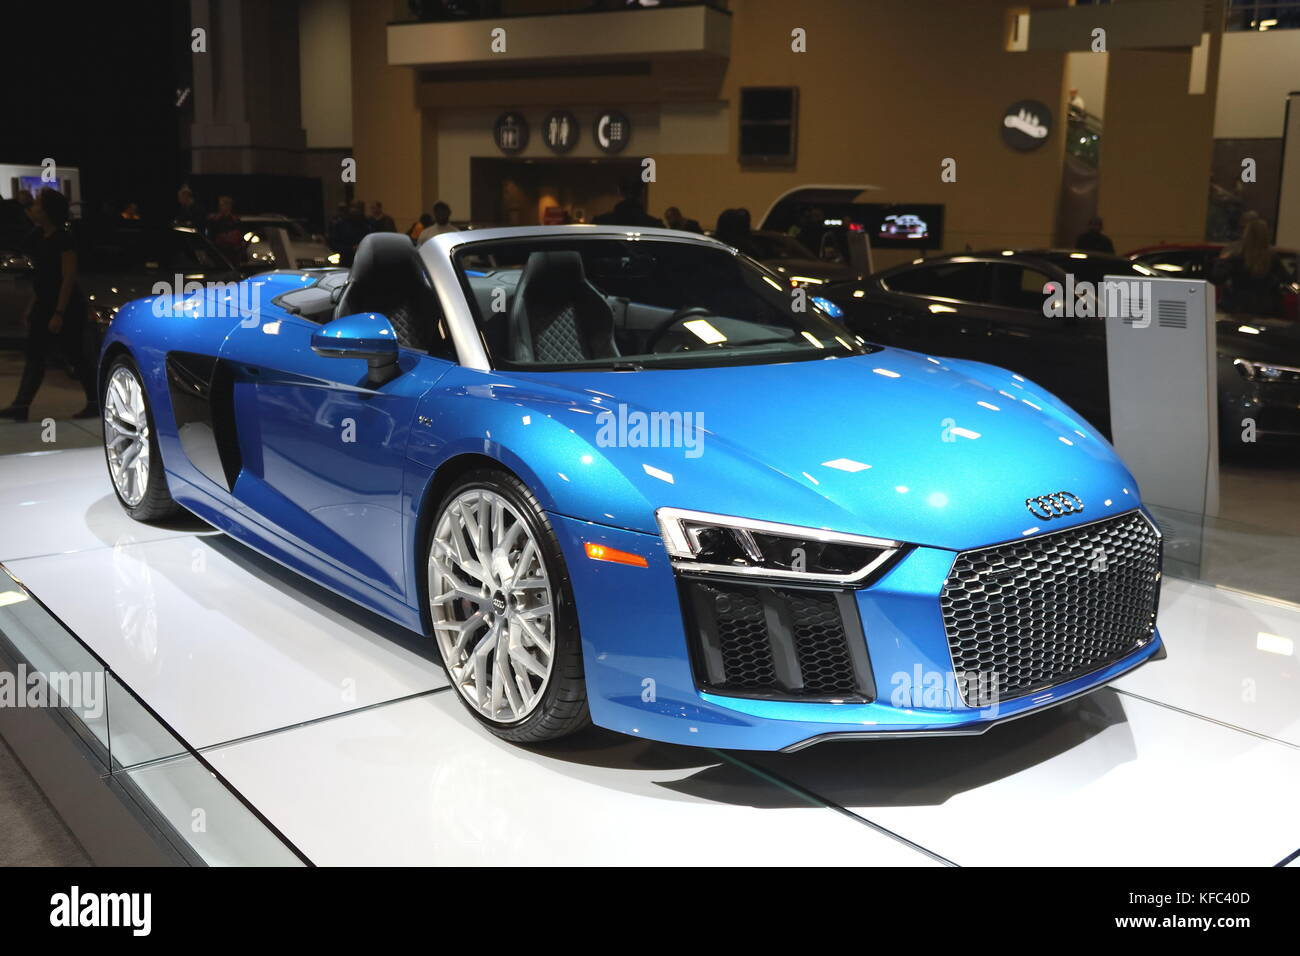 Audi R8, 2017 Auto Show, Washington DC - Stock Image